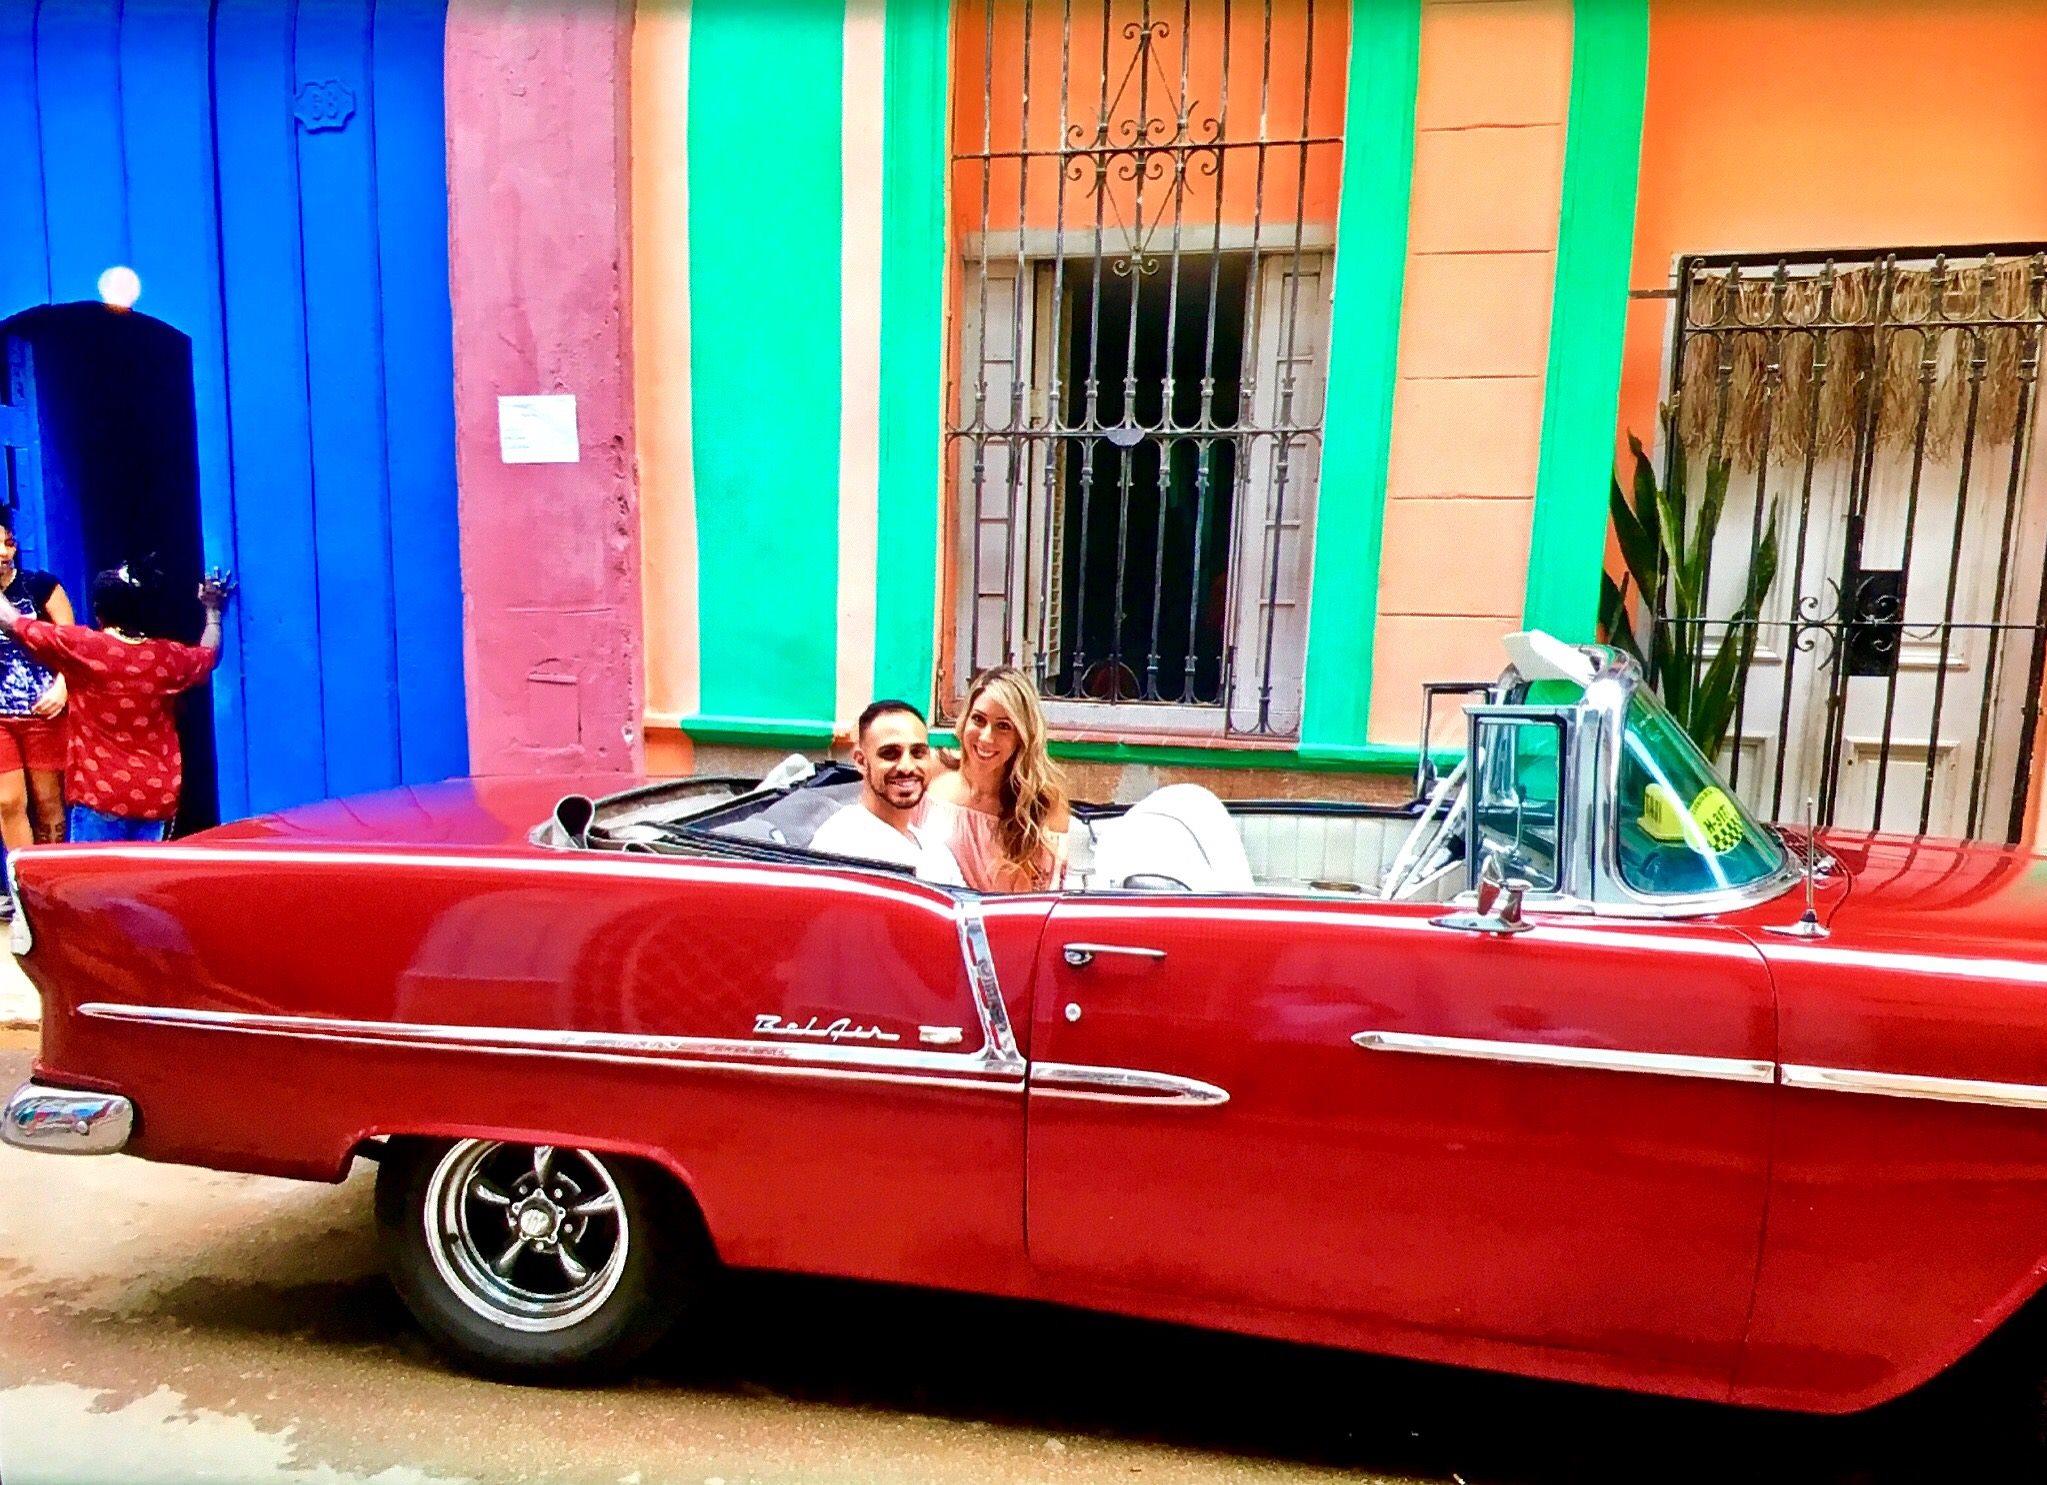 cuba-natasha-classic-car-ride-rodrigo